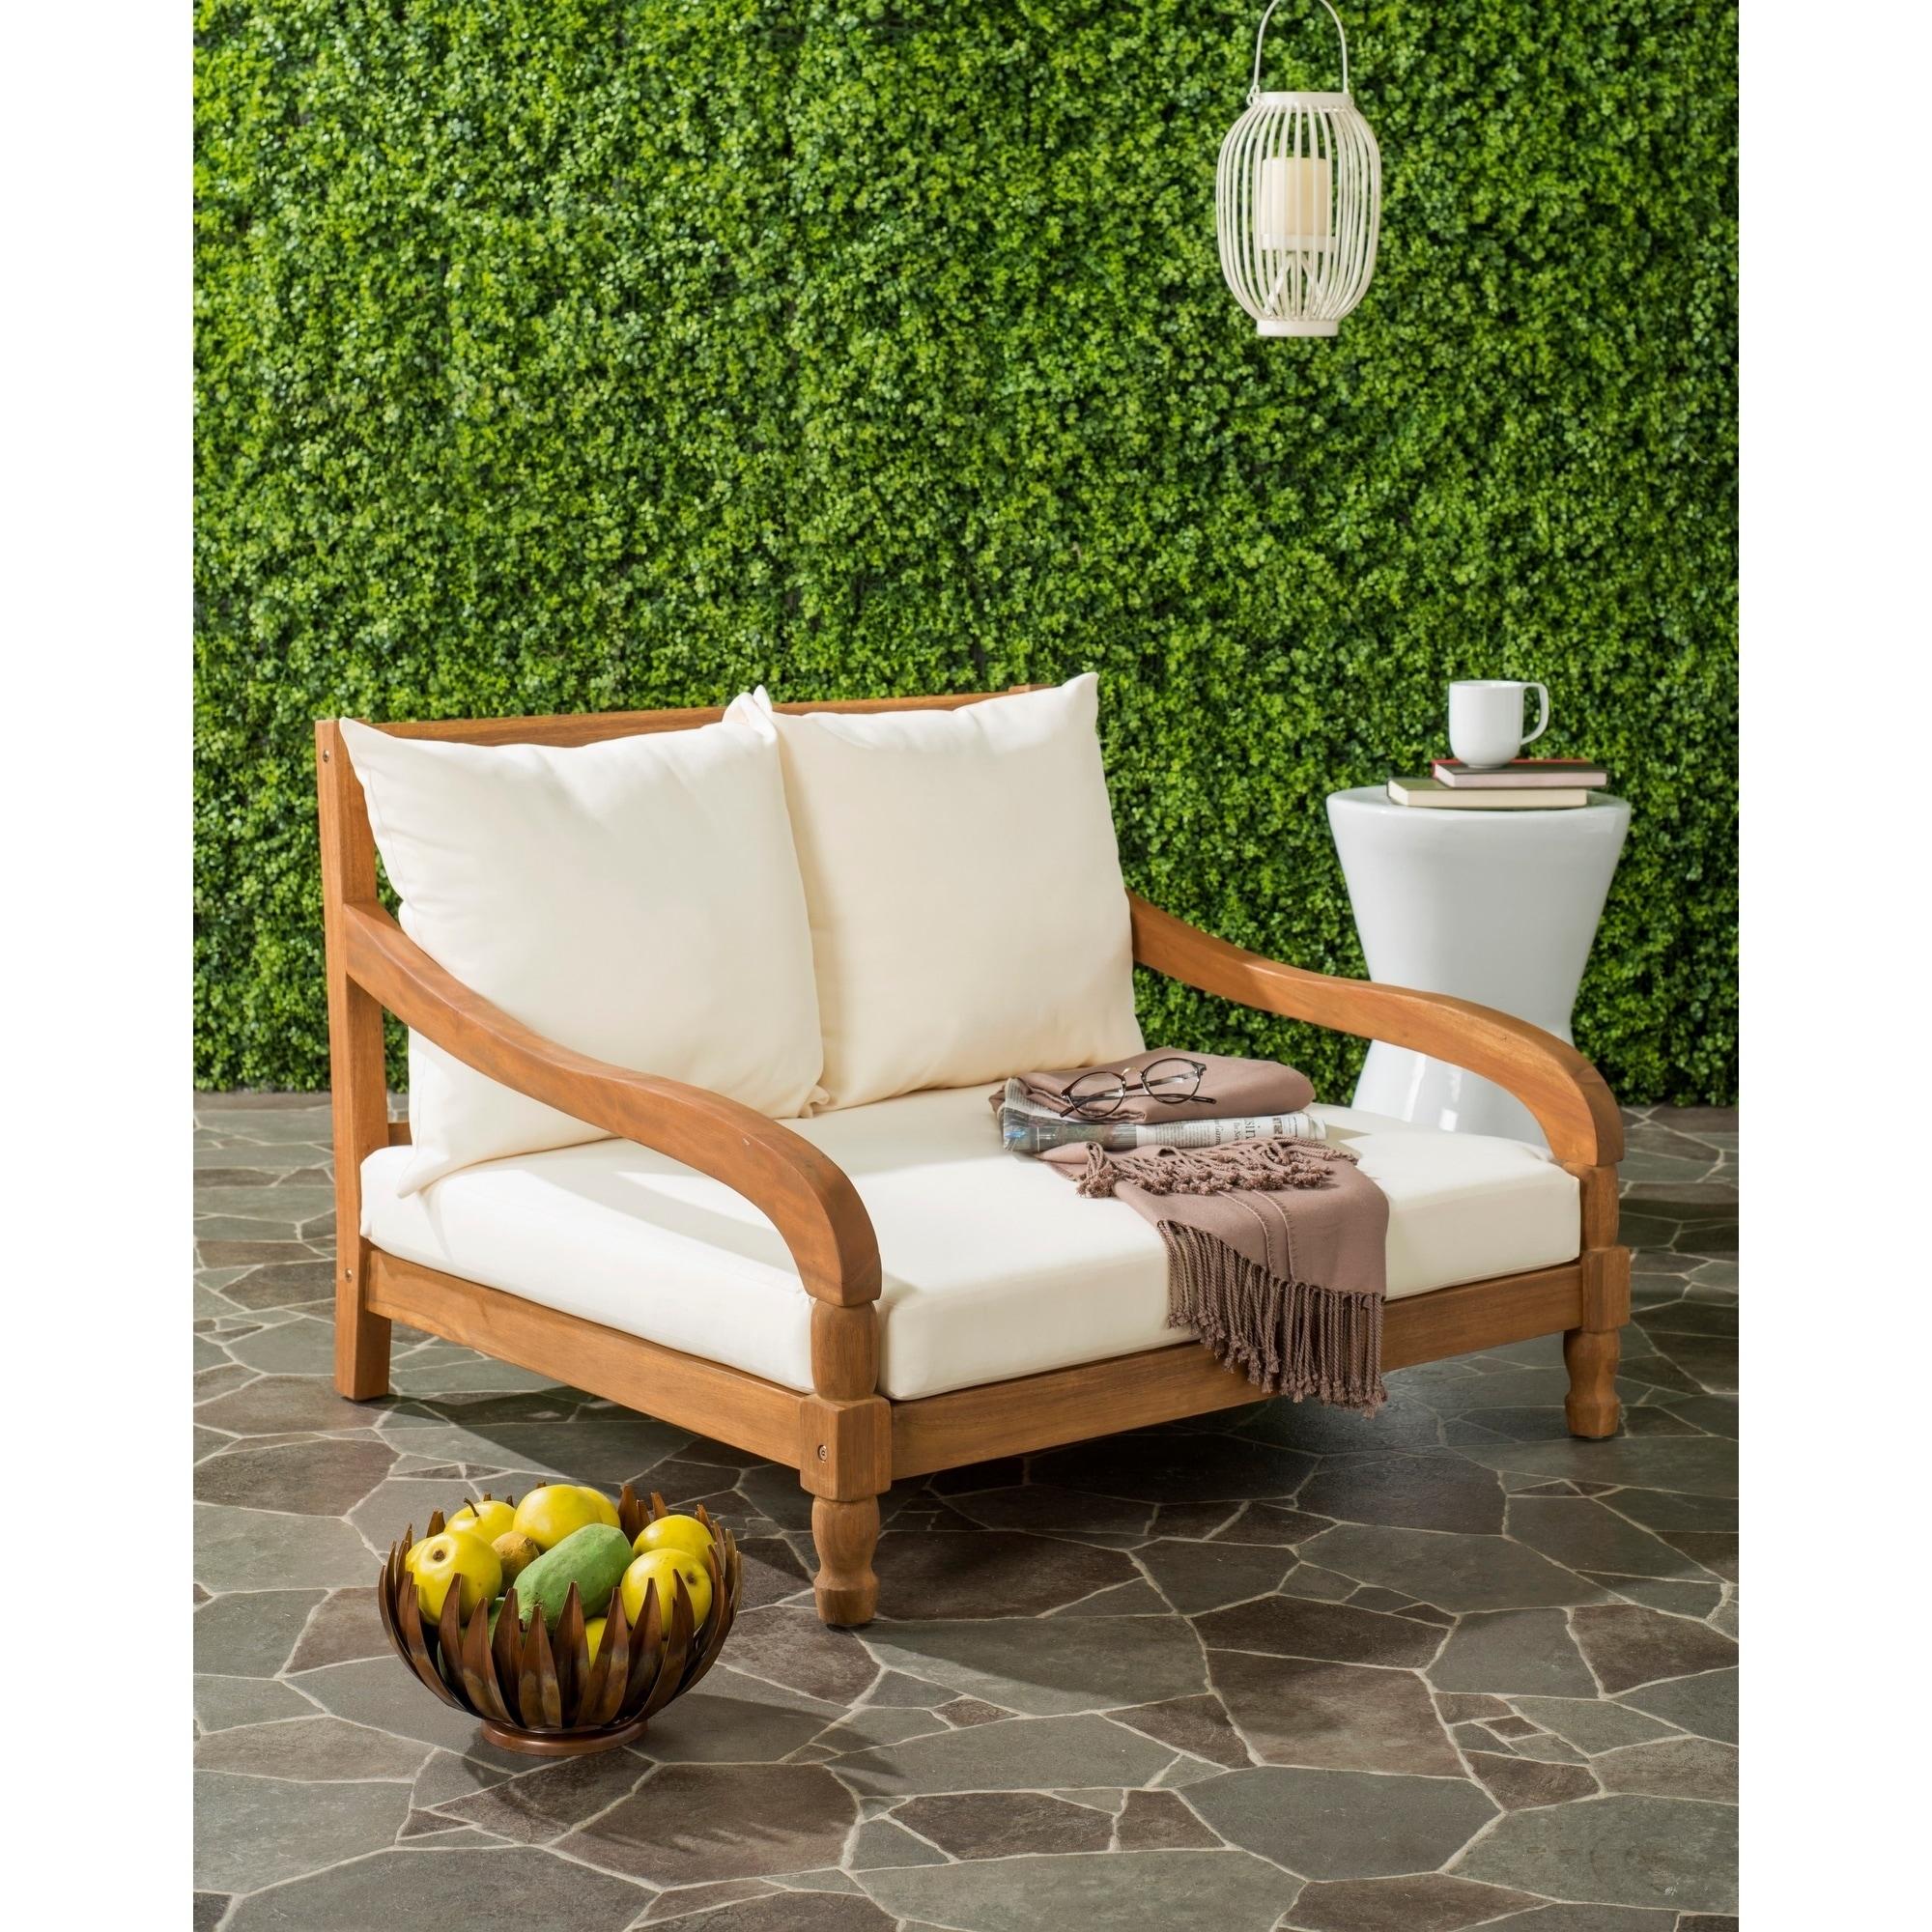 Safavieh Pomona Outdoor Brown/ Beige Lounger (PAT6740A), ...